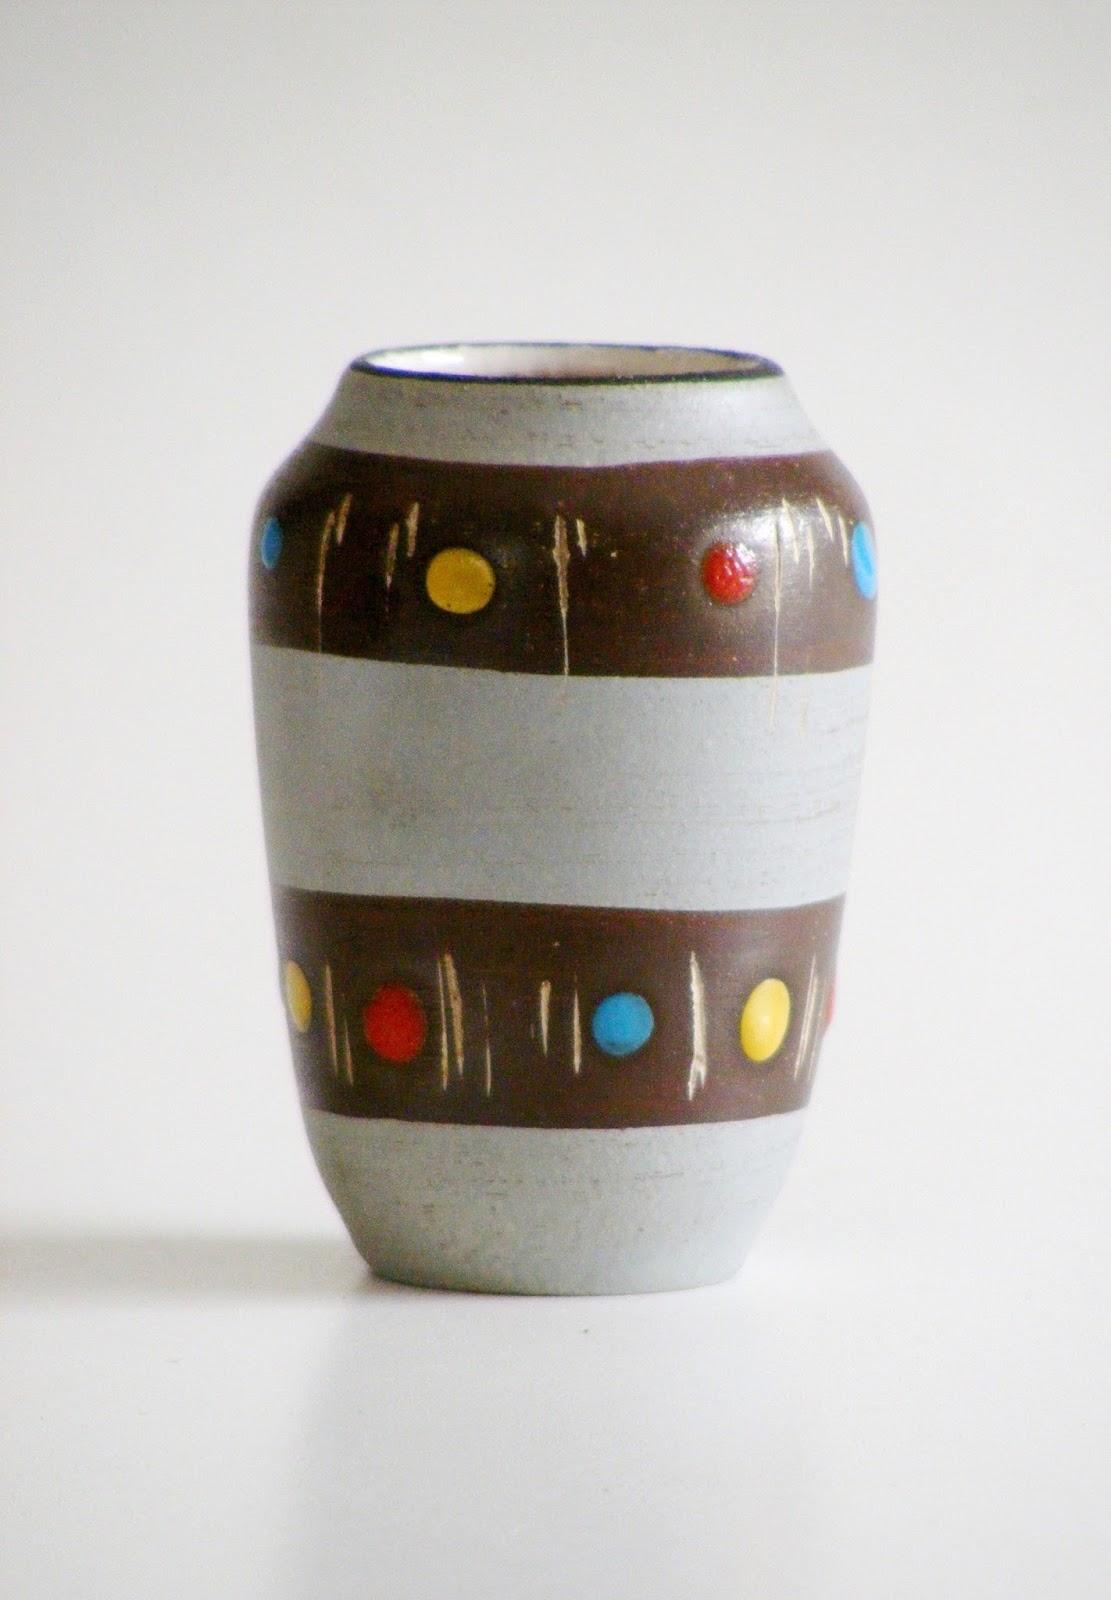 Vamp furniture west german vases at vamp04 november 2017 a small mid century west germany ceramic vase with polka dot pattern reviewsmspy